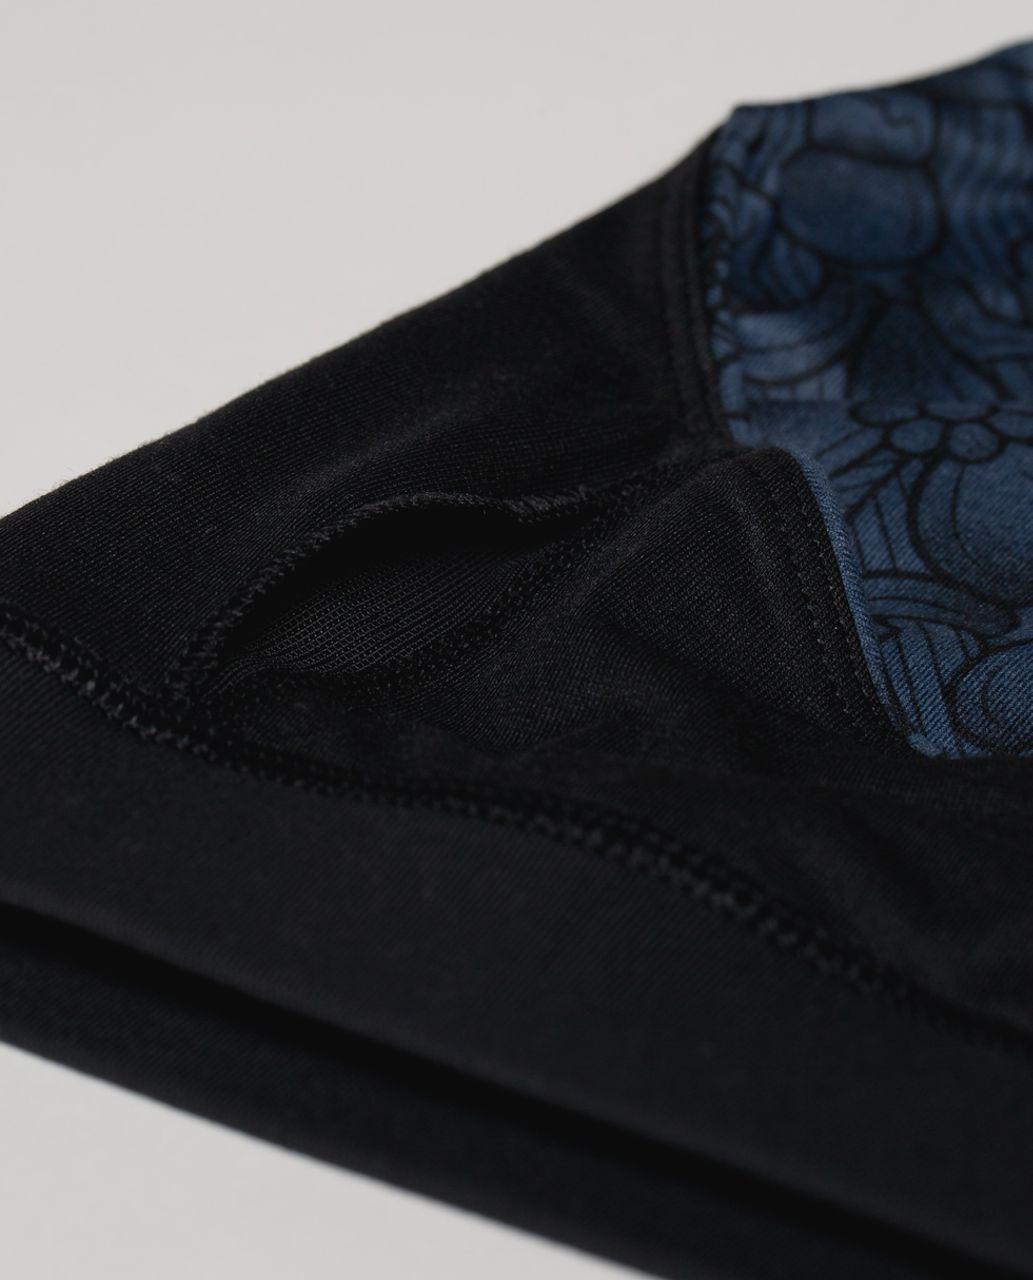 Lululemon 50 Rep Bra - Prisma Inkwell Black / Black